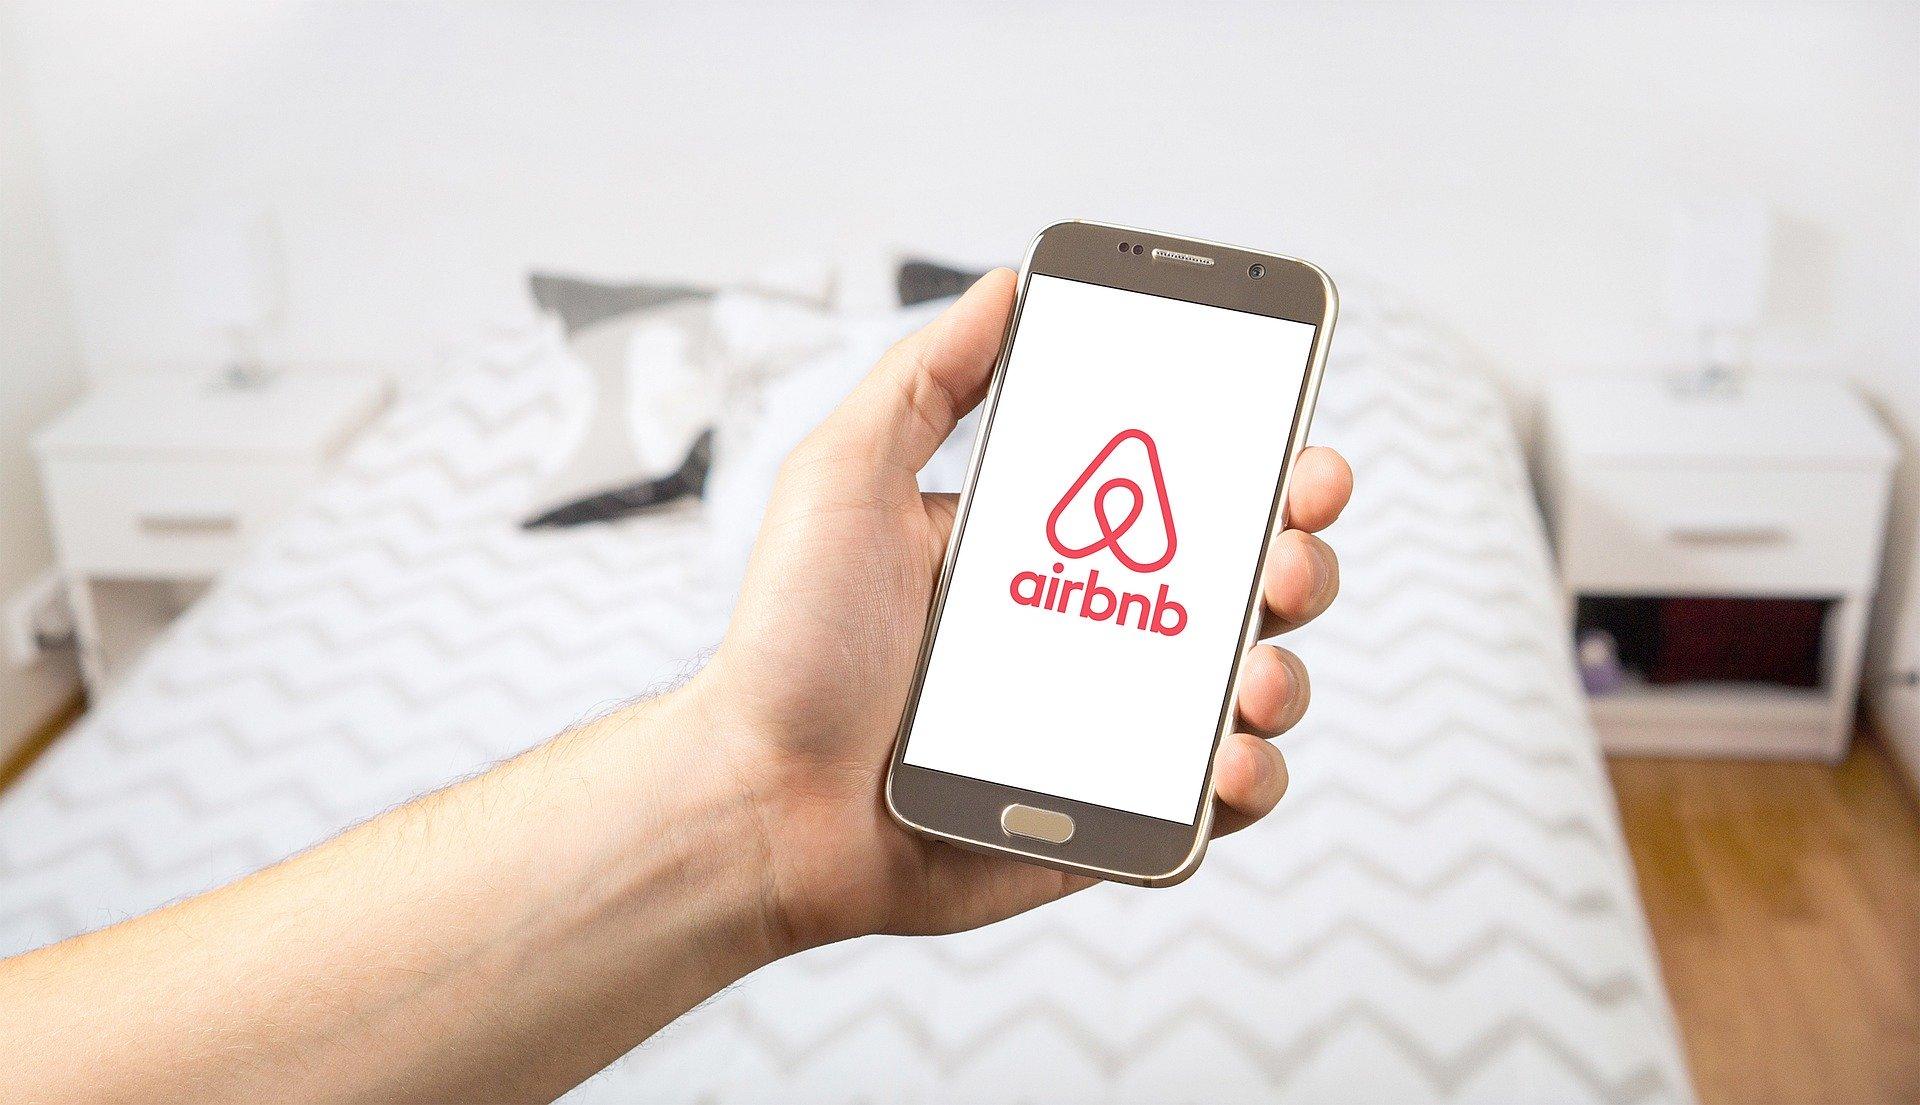 Obrázek: Slavný designérský guru Applu Jony Ive chystá spolupráci s Airbnb